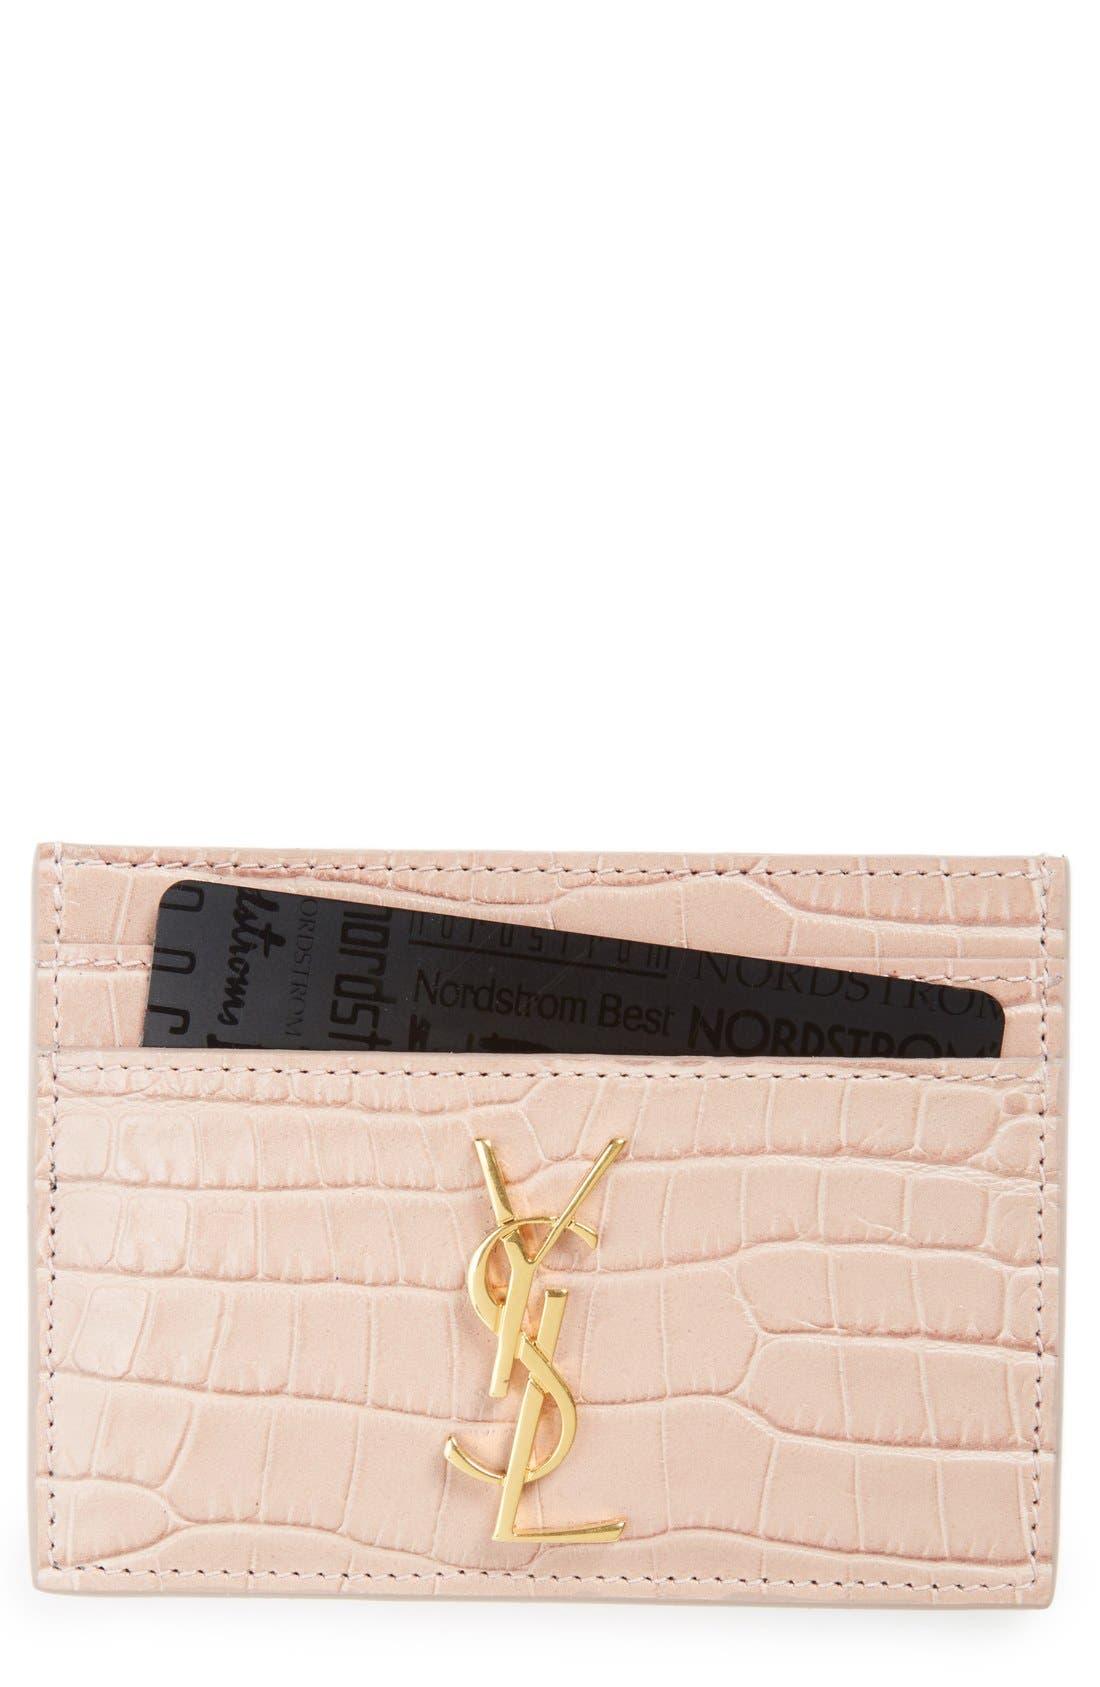 Main Image - Saint Laurent Monogram Croc Embossed Leather Card Case